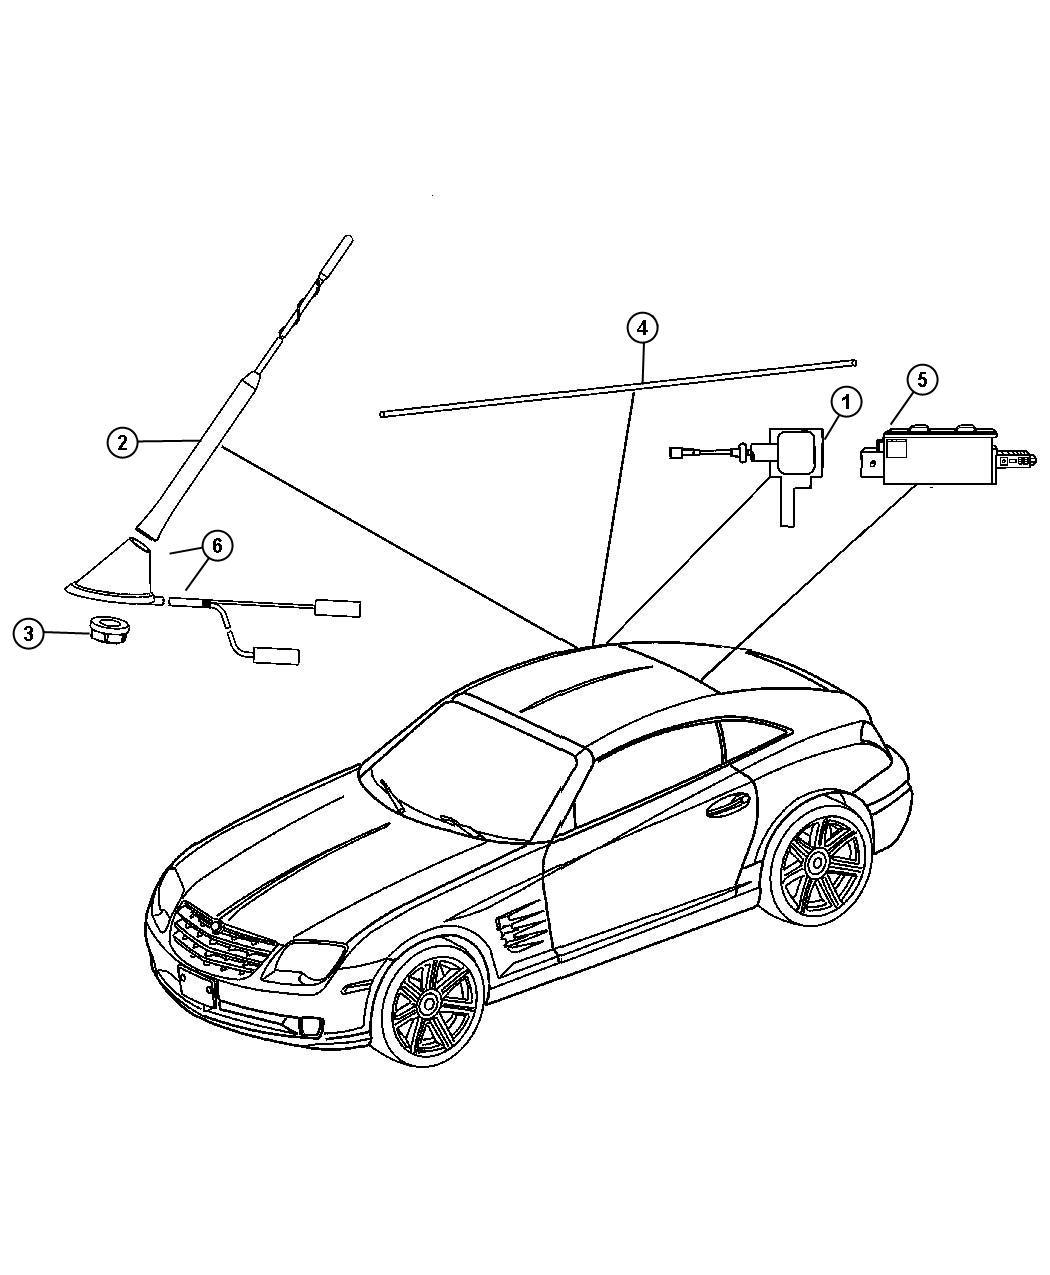 Service manual [2005 Chrysler Crossfire Antenna Repair